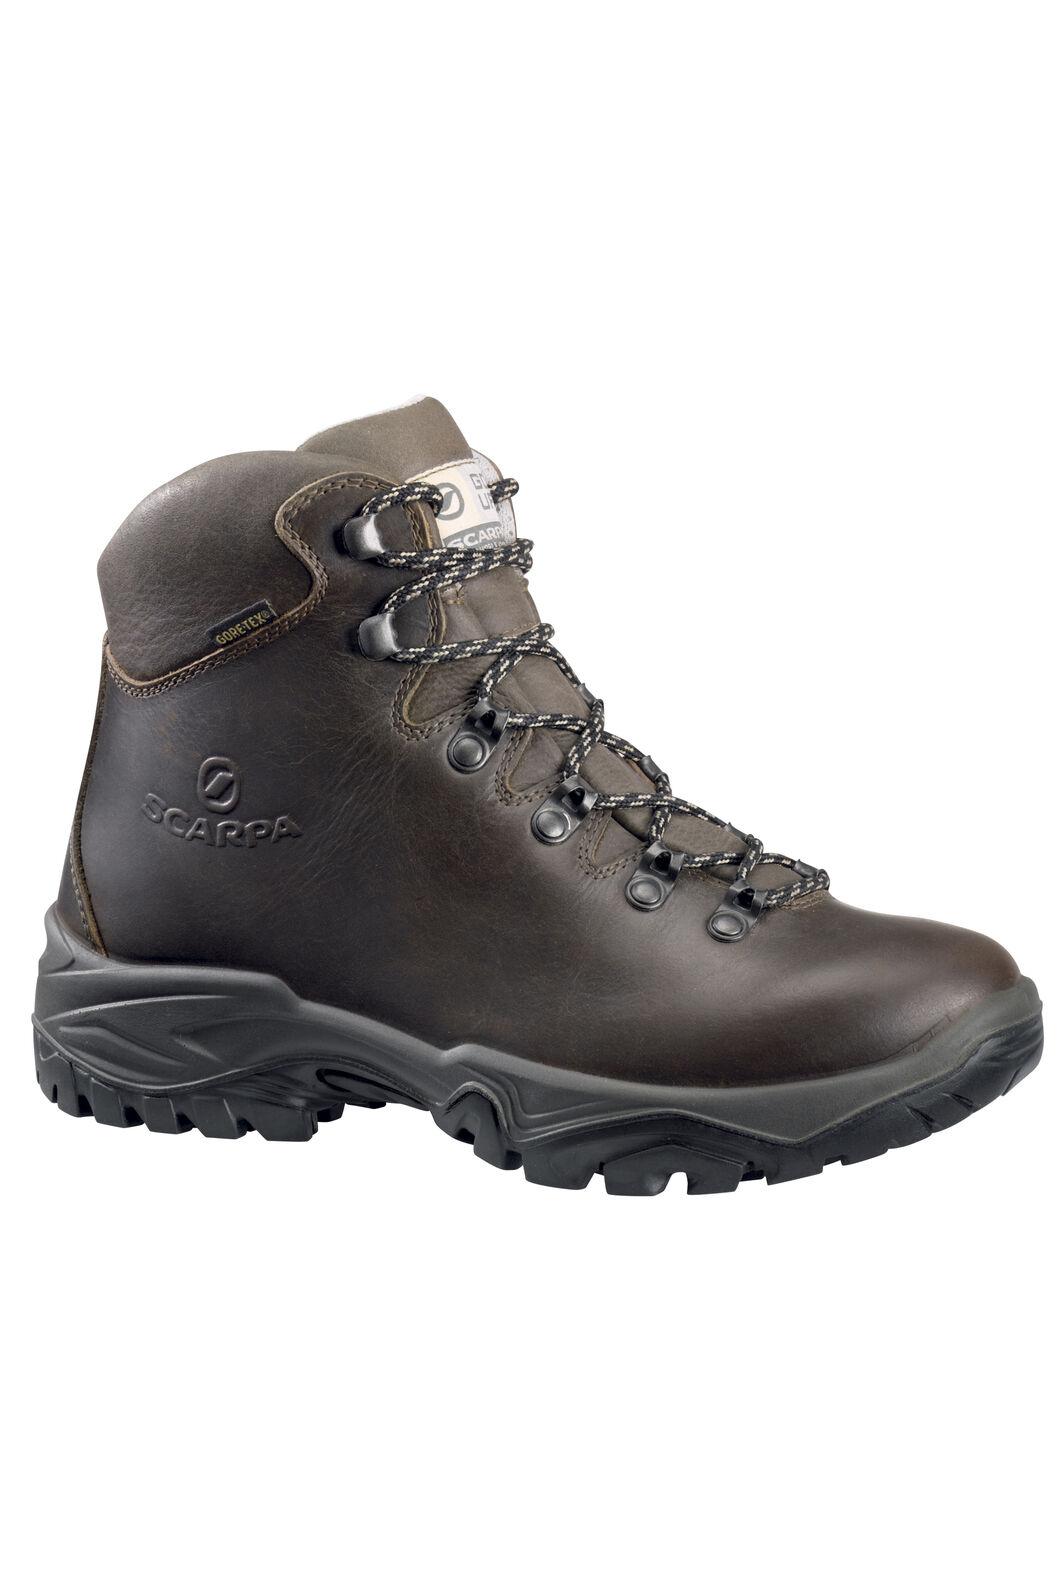 Scarpa Terra GTX Boots - Men s e6c2df10747